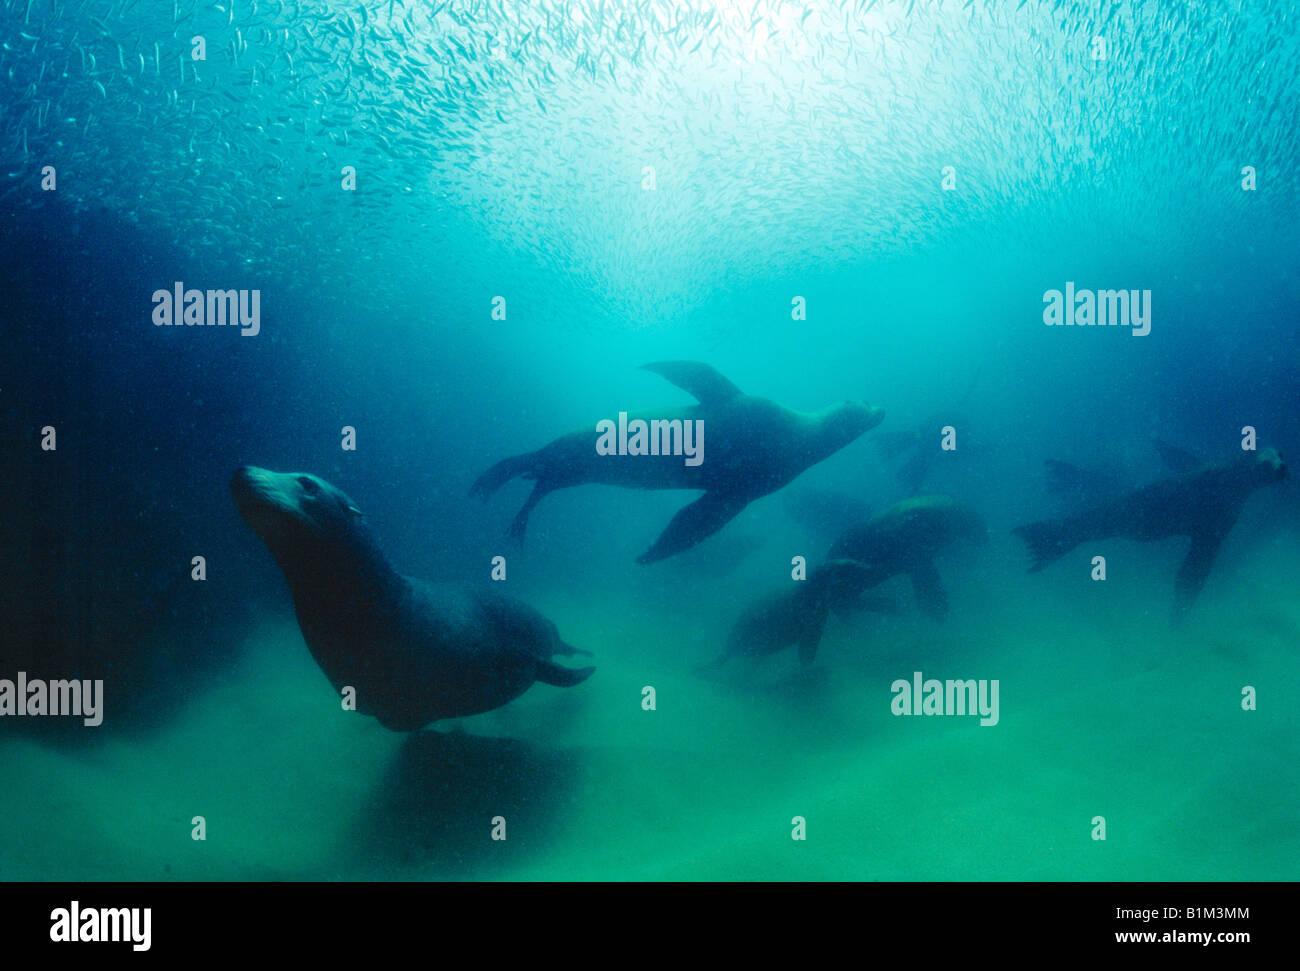 Wildlife, Mammal, Sea Lions underwater, Mexico, Baja Peninsula, - Stock Image